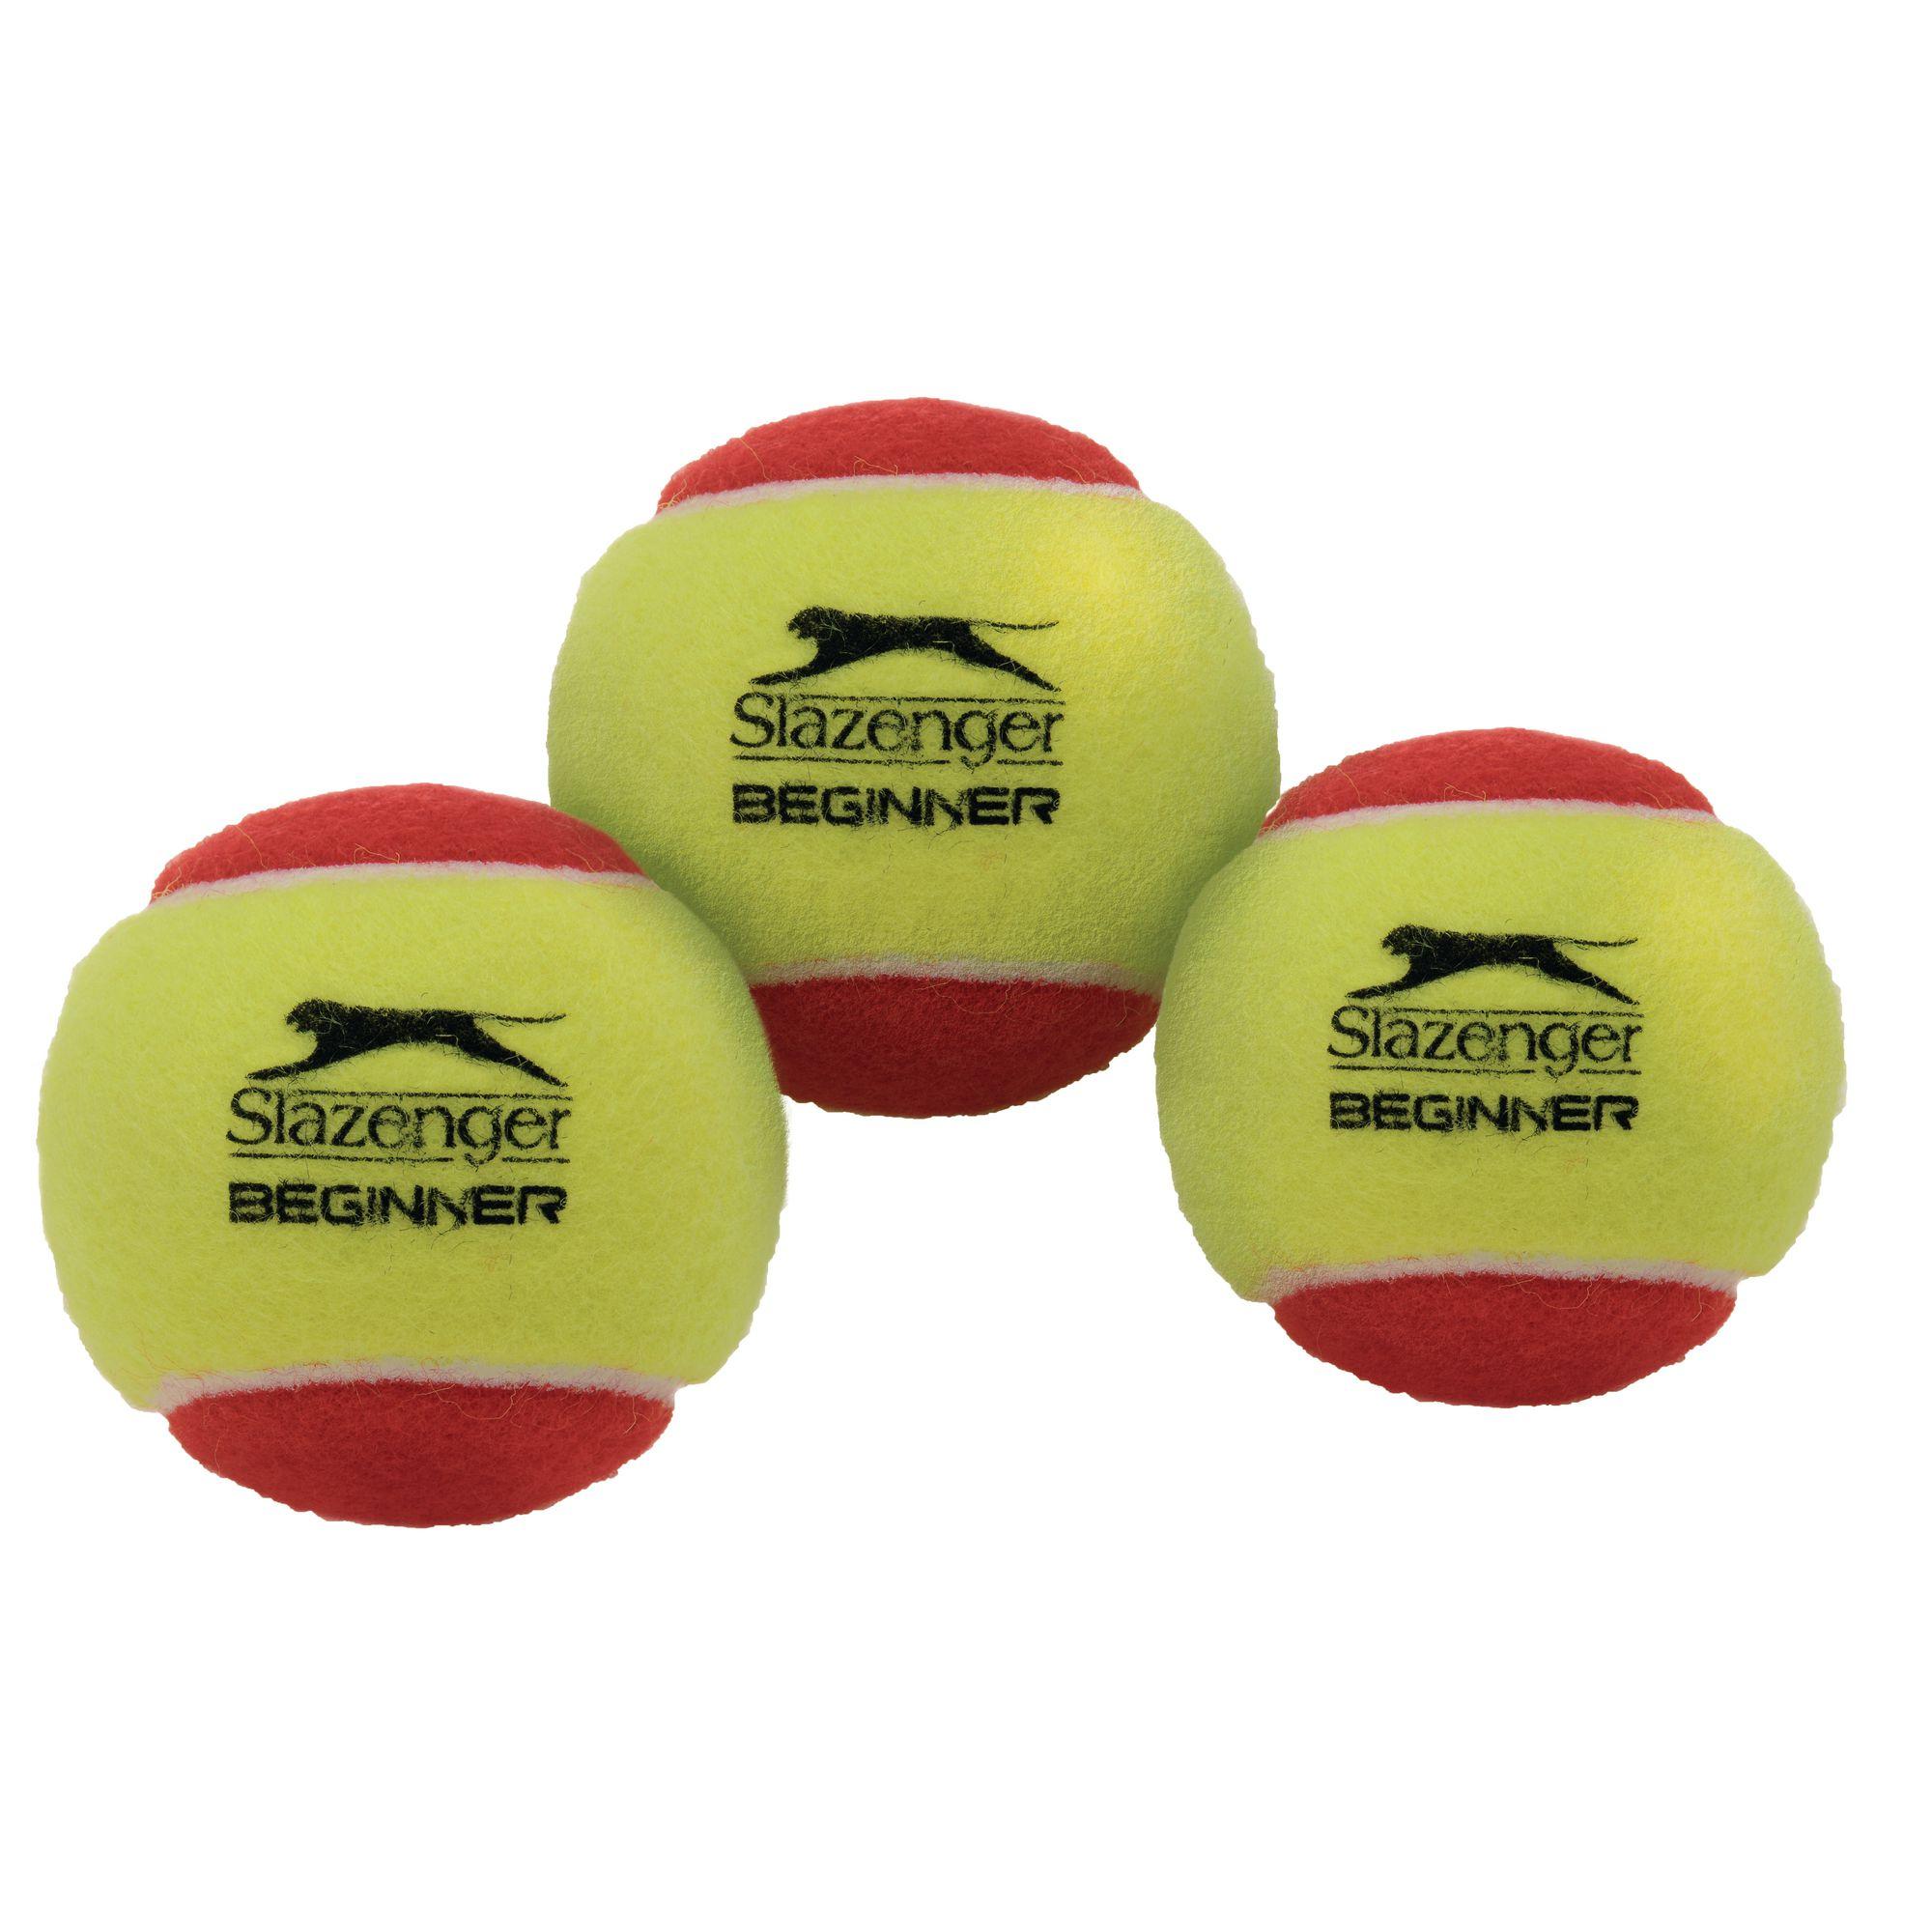 Itnp05053 Slazenger Mini Red Stage Tennis Balls Pack Of 3 Findel International